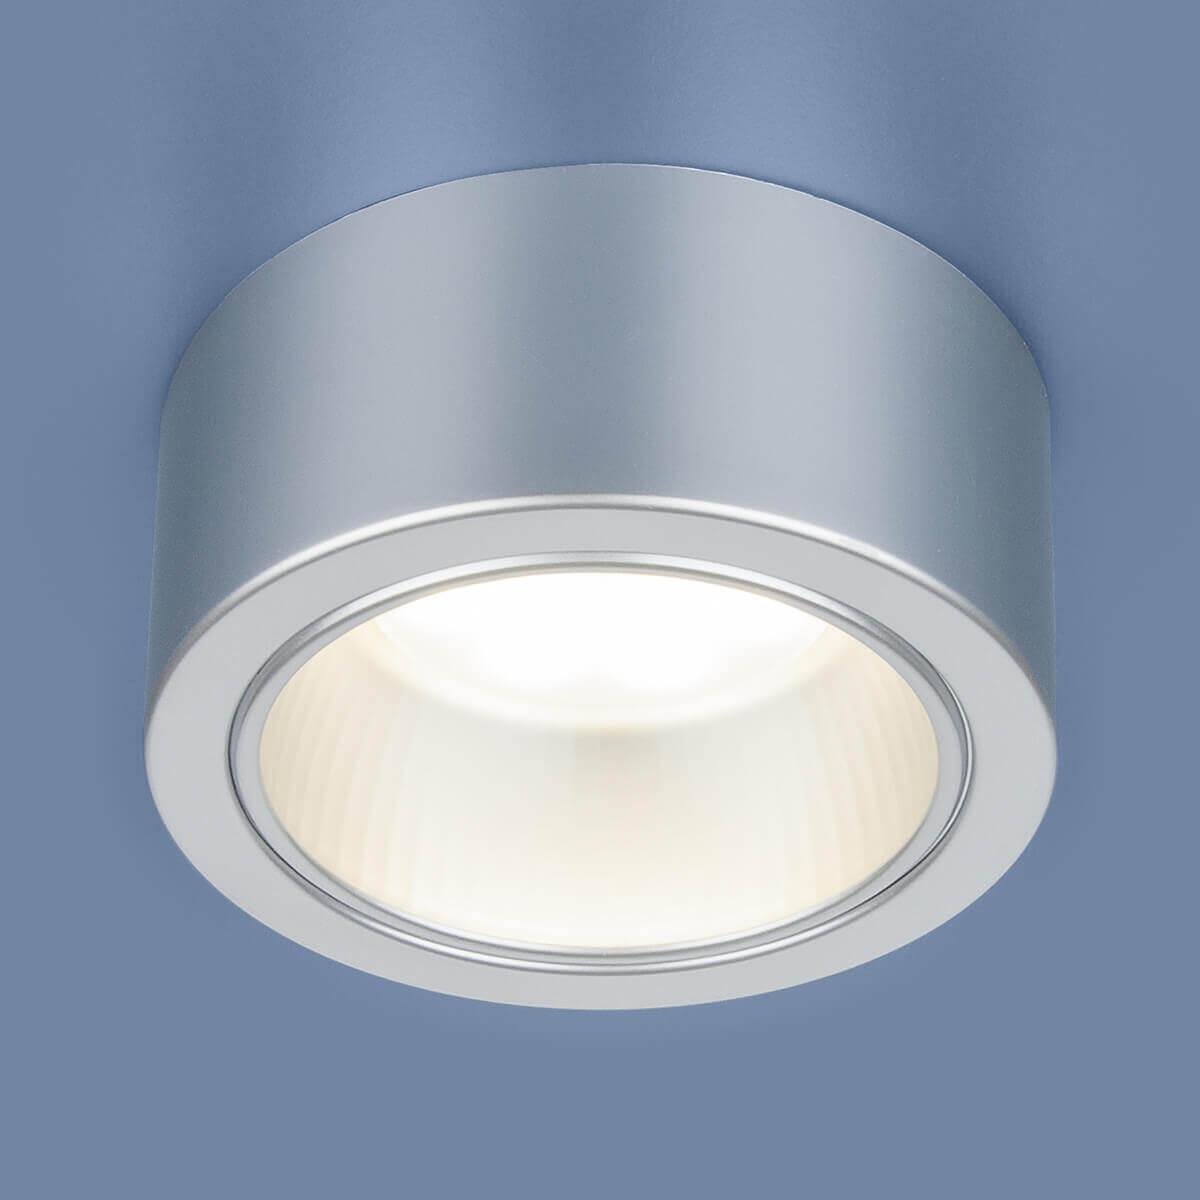 Светильник накладной 1070 GX53.SL серебро